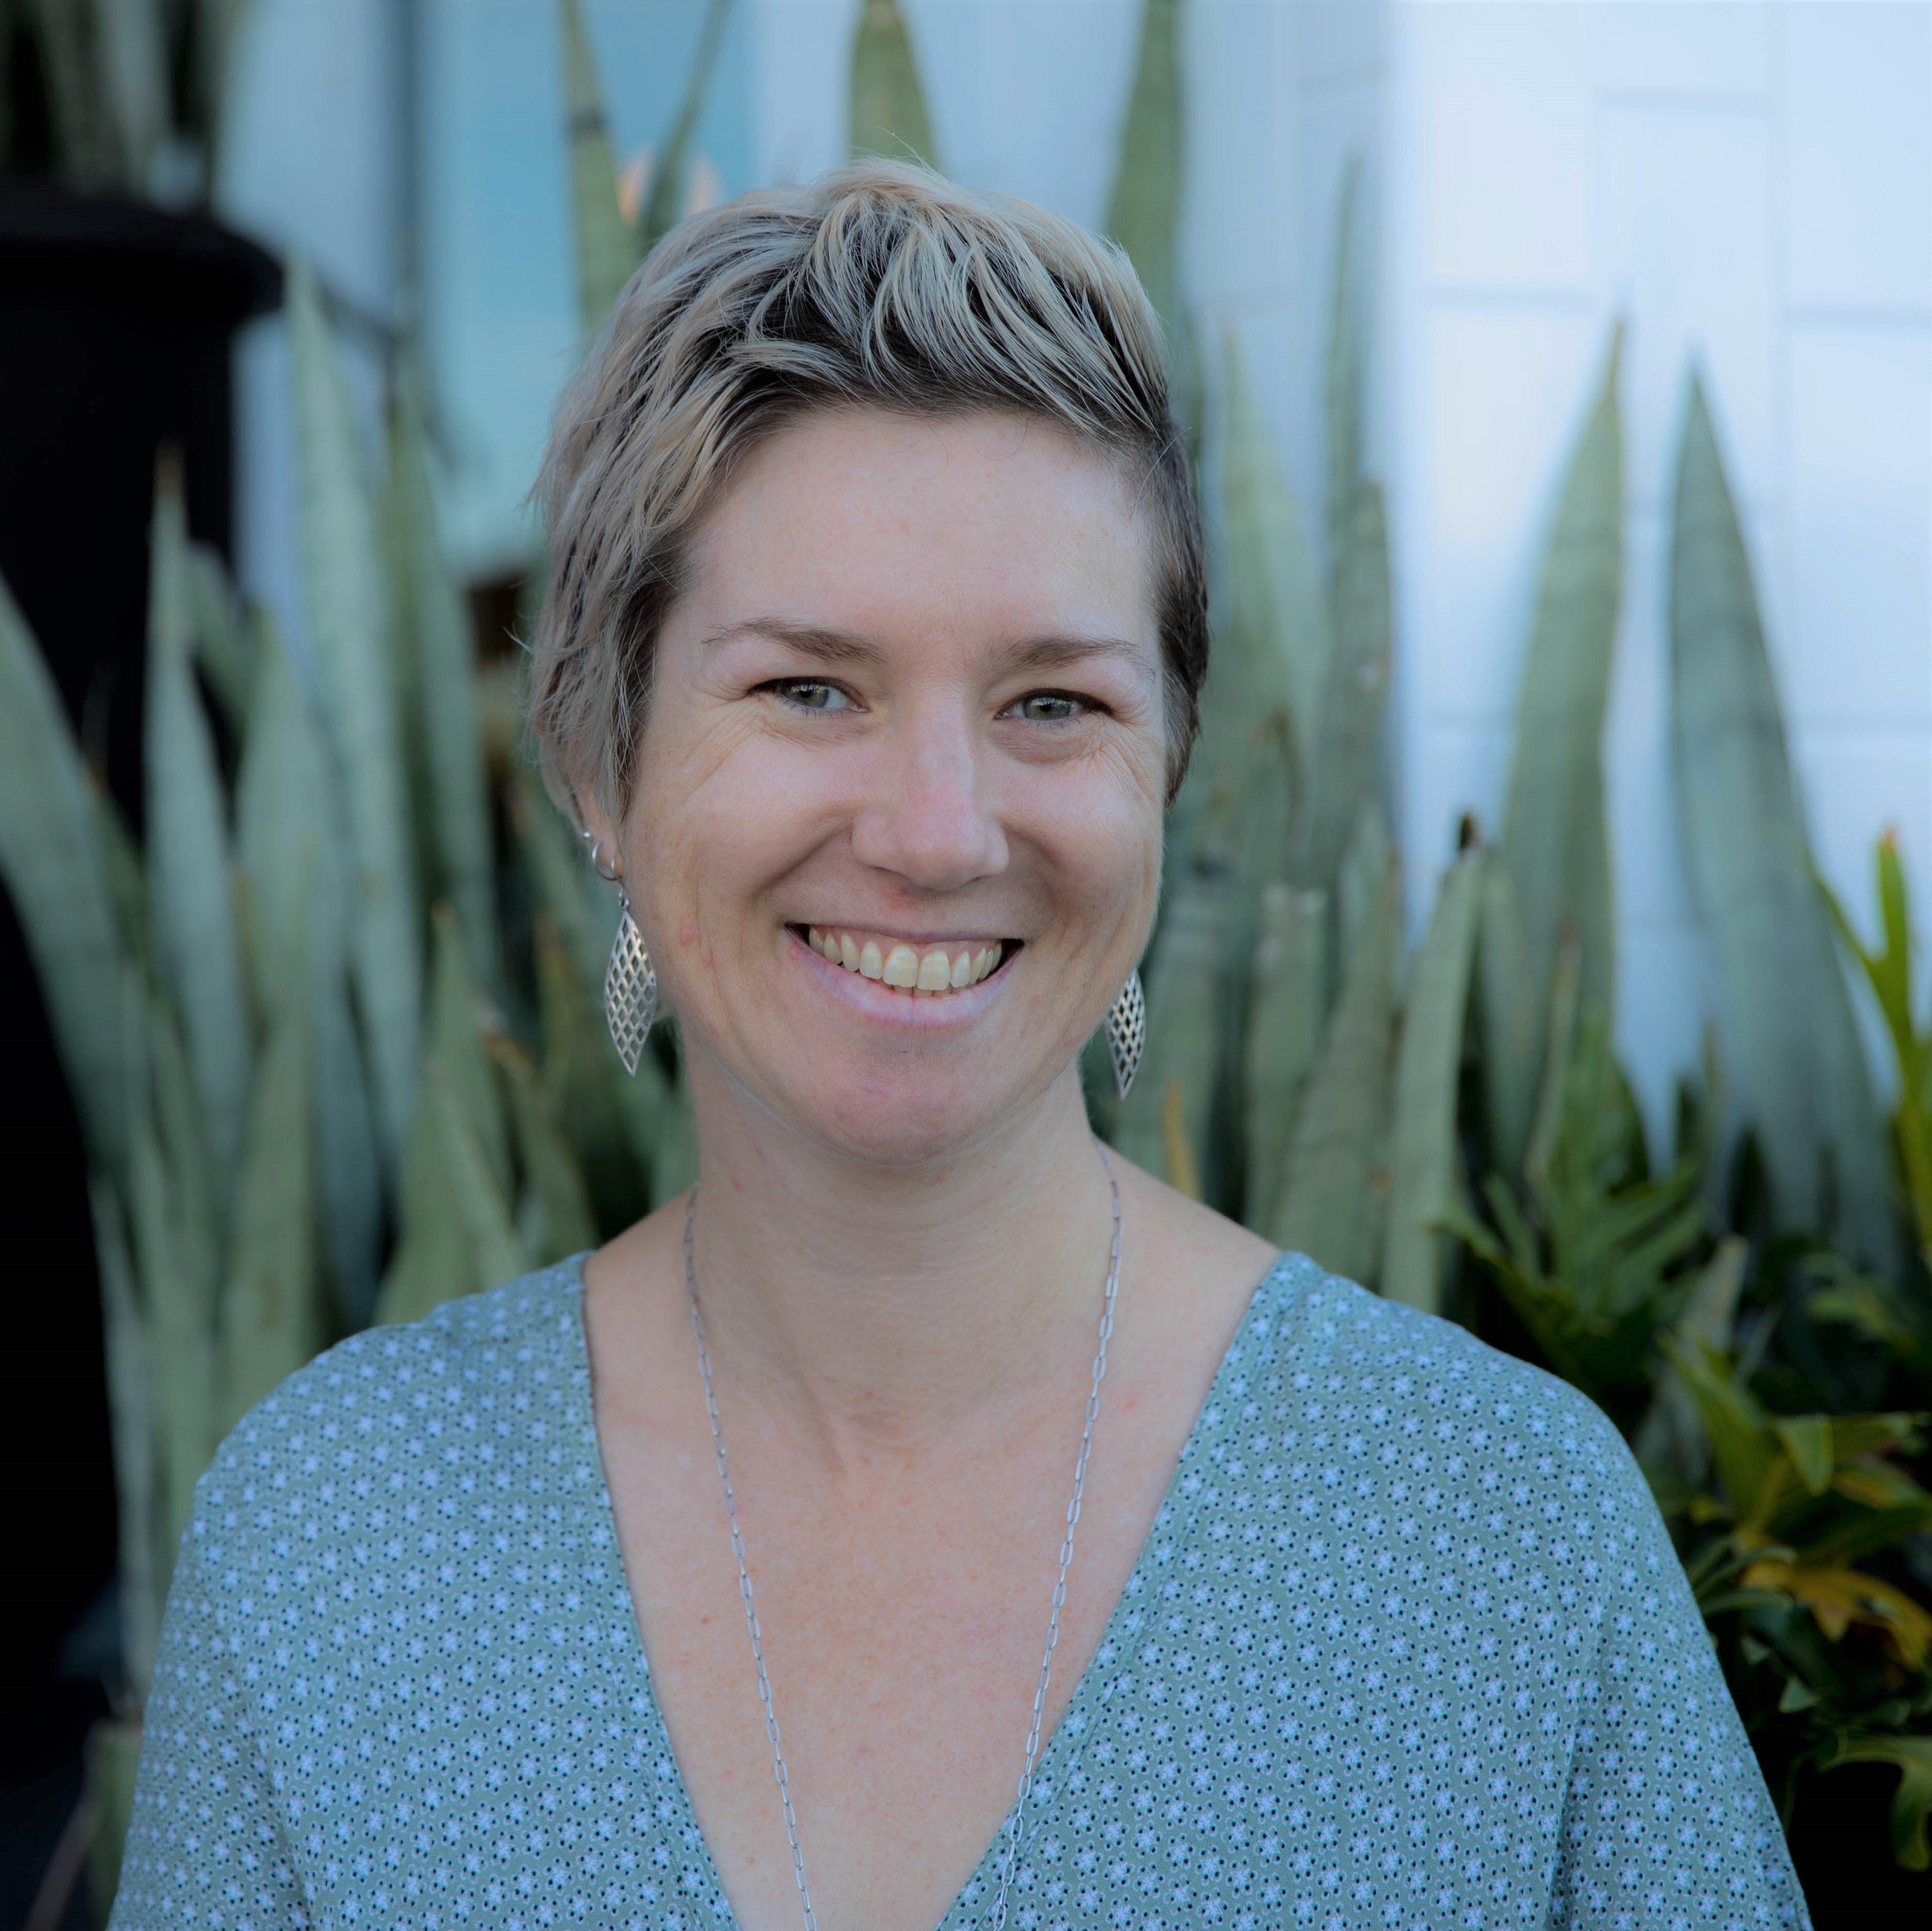 Chrissy Foreman